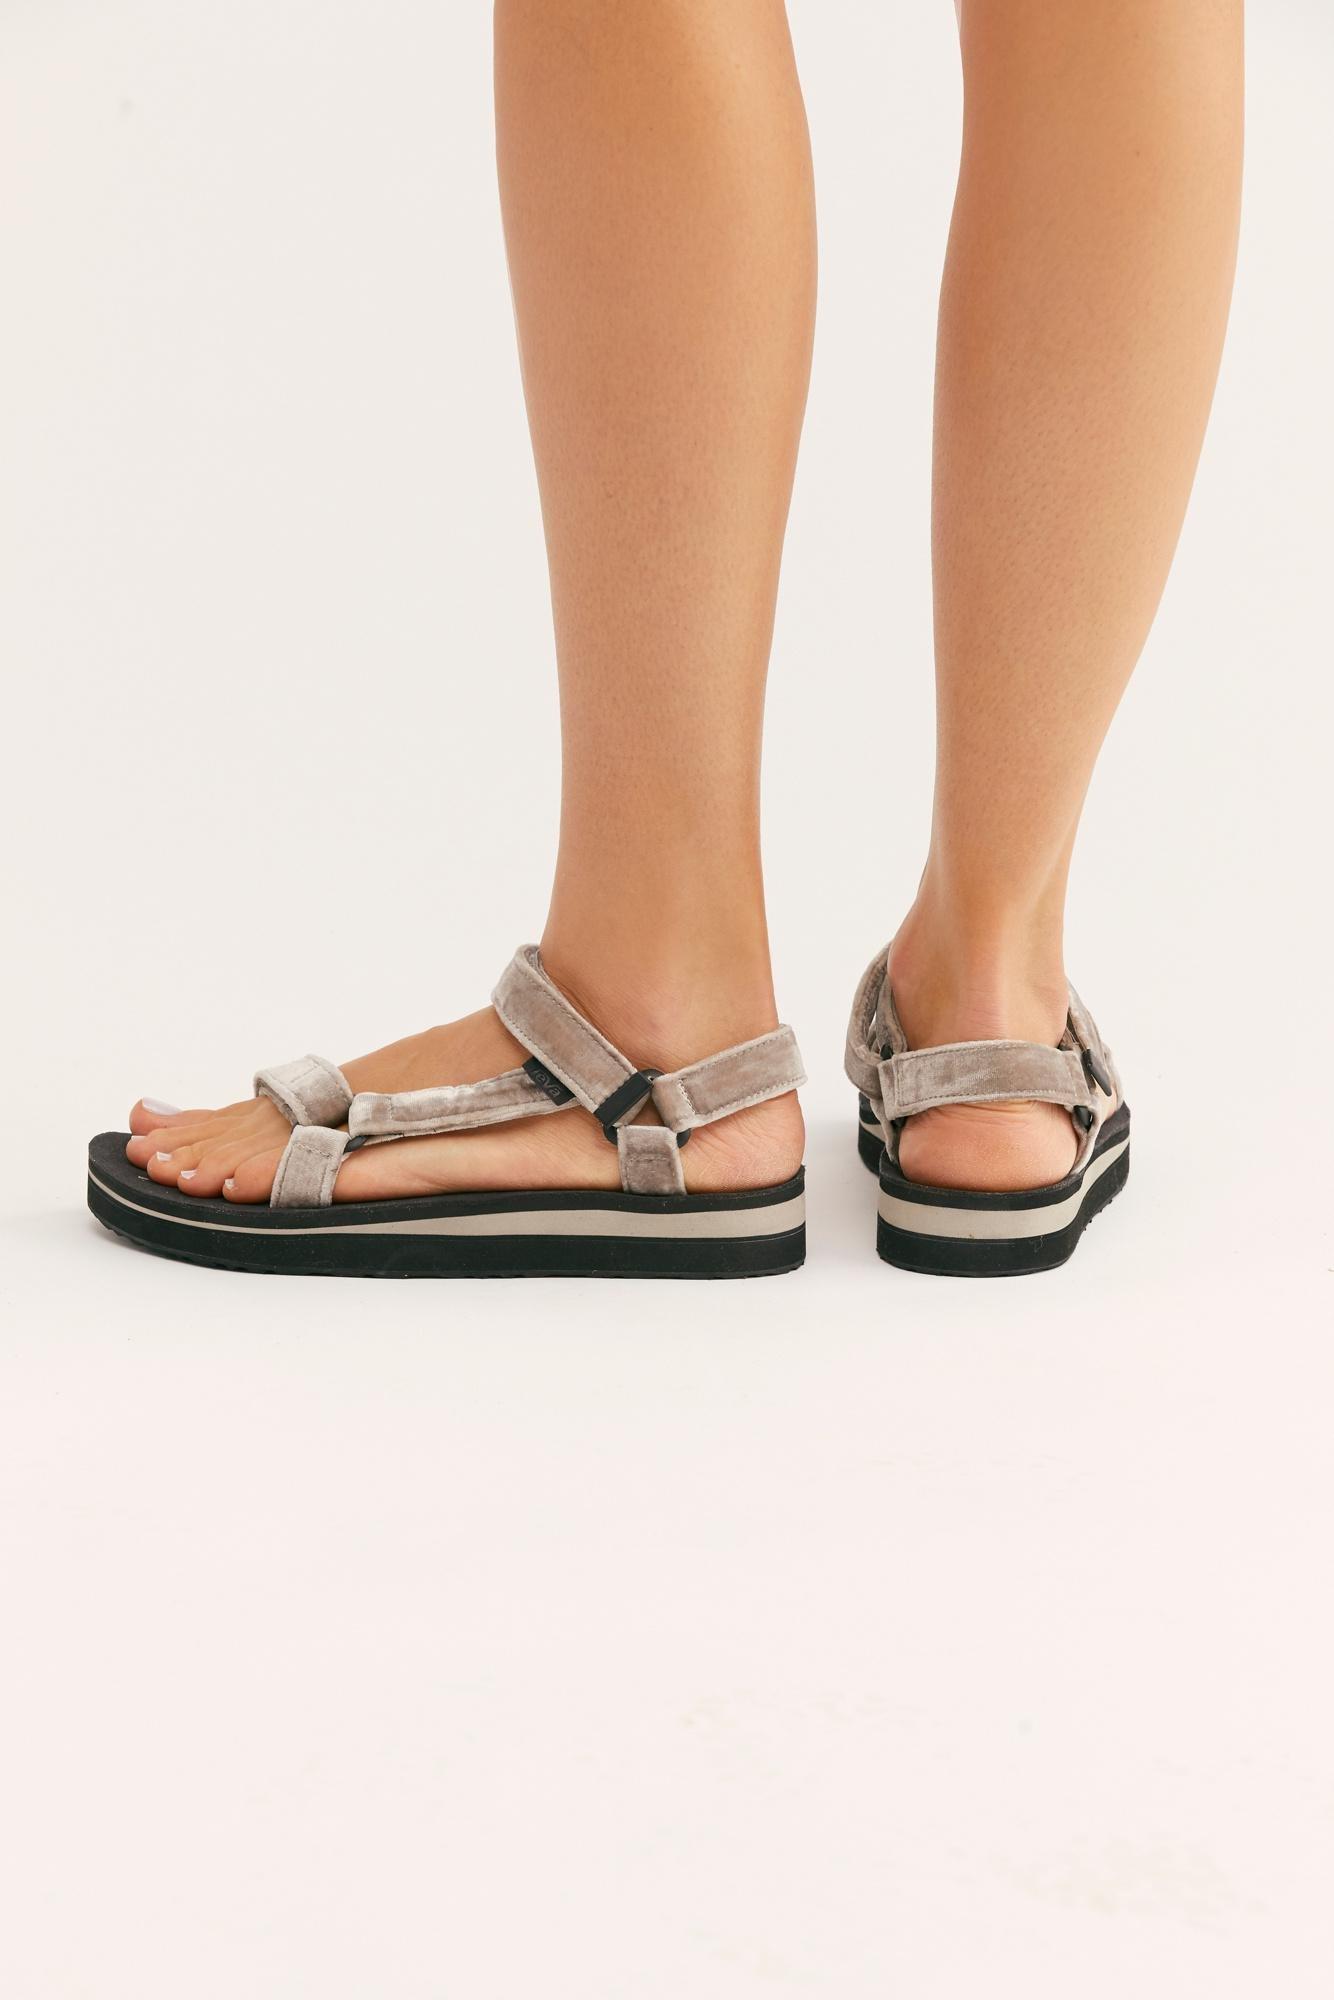 b41f30afa90 Free People - Metallic Midform Universal Holiday Sandal By Teva - Lyst.  View fullscreen